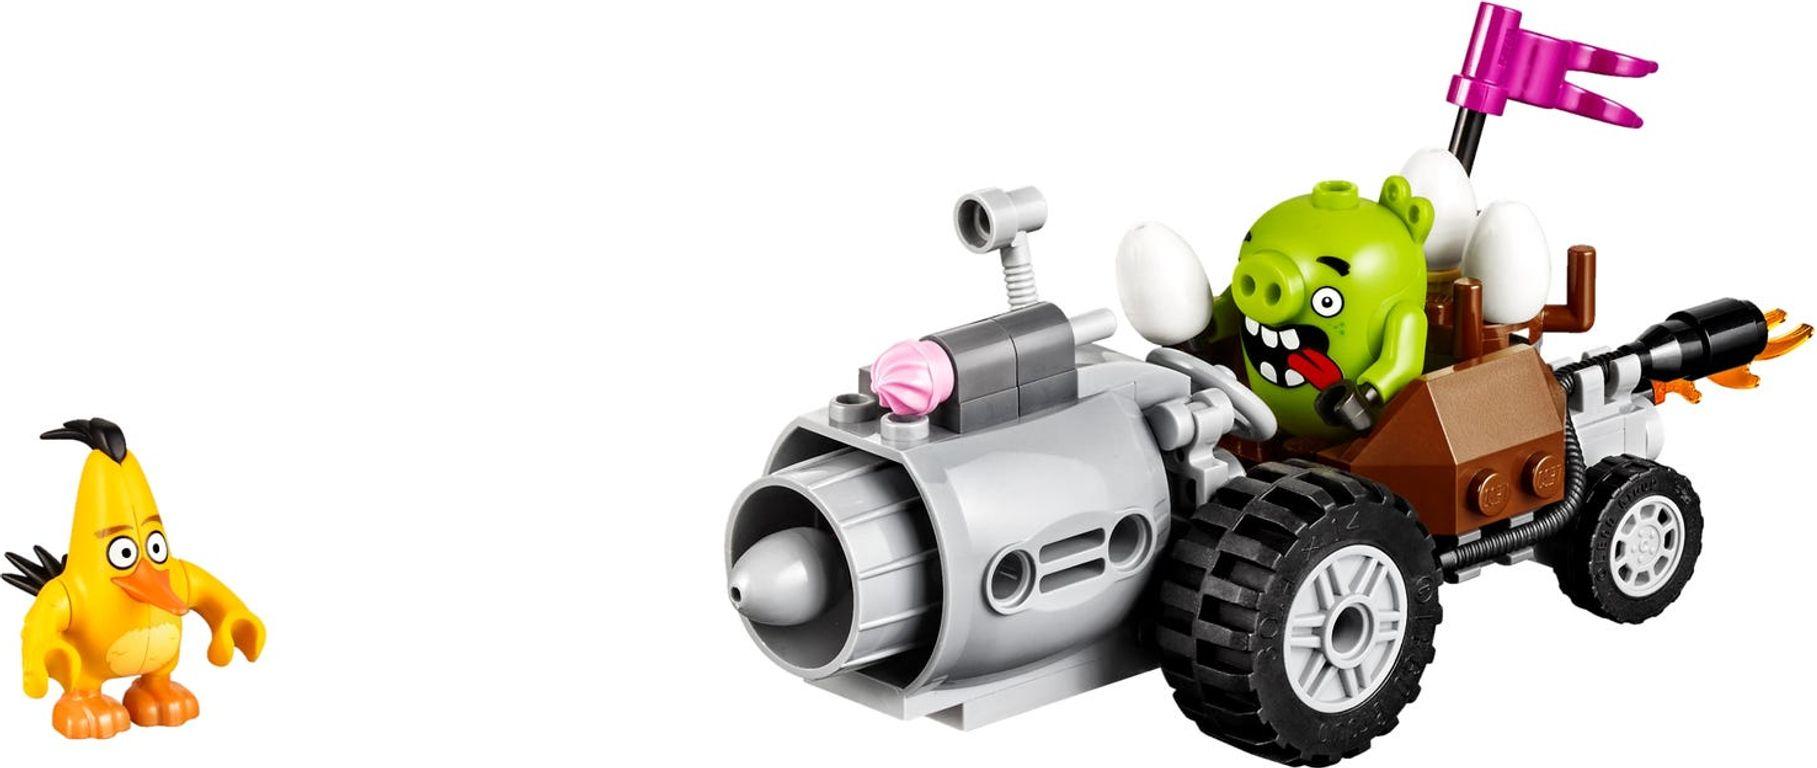 Piggy Car Escape components